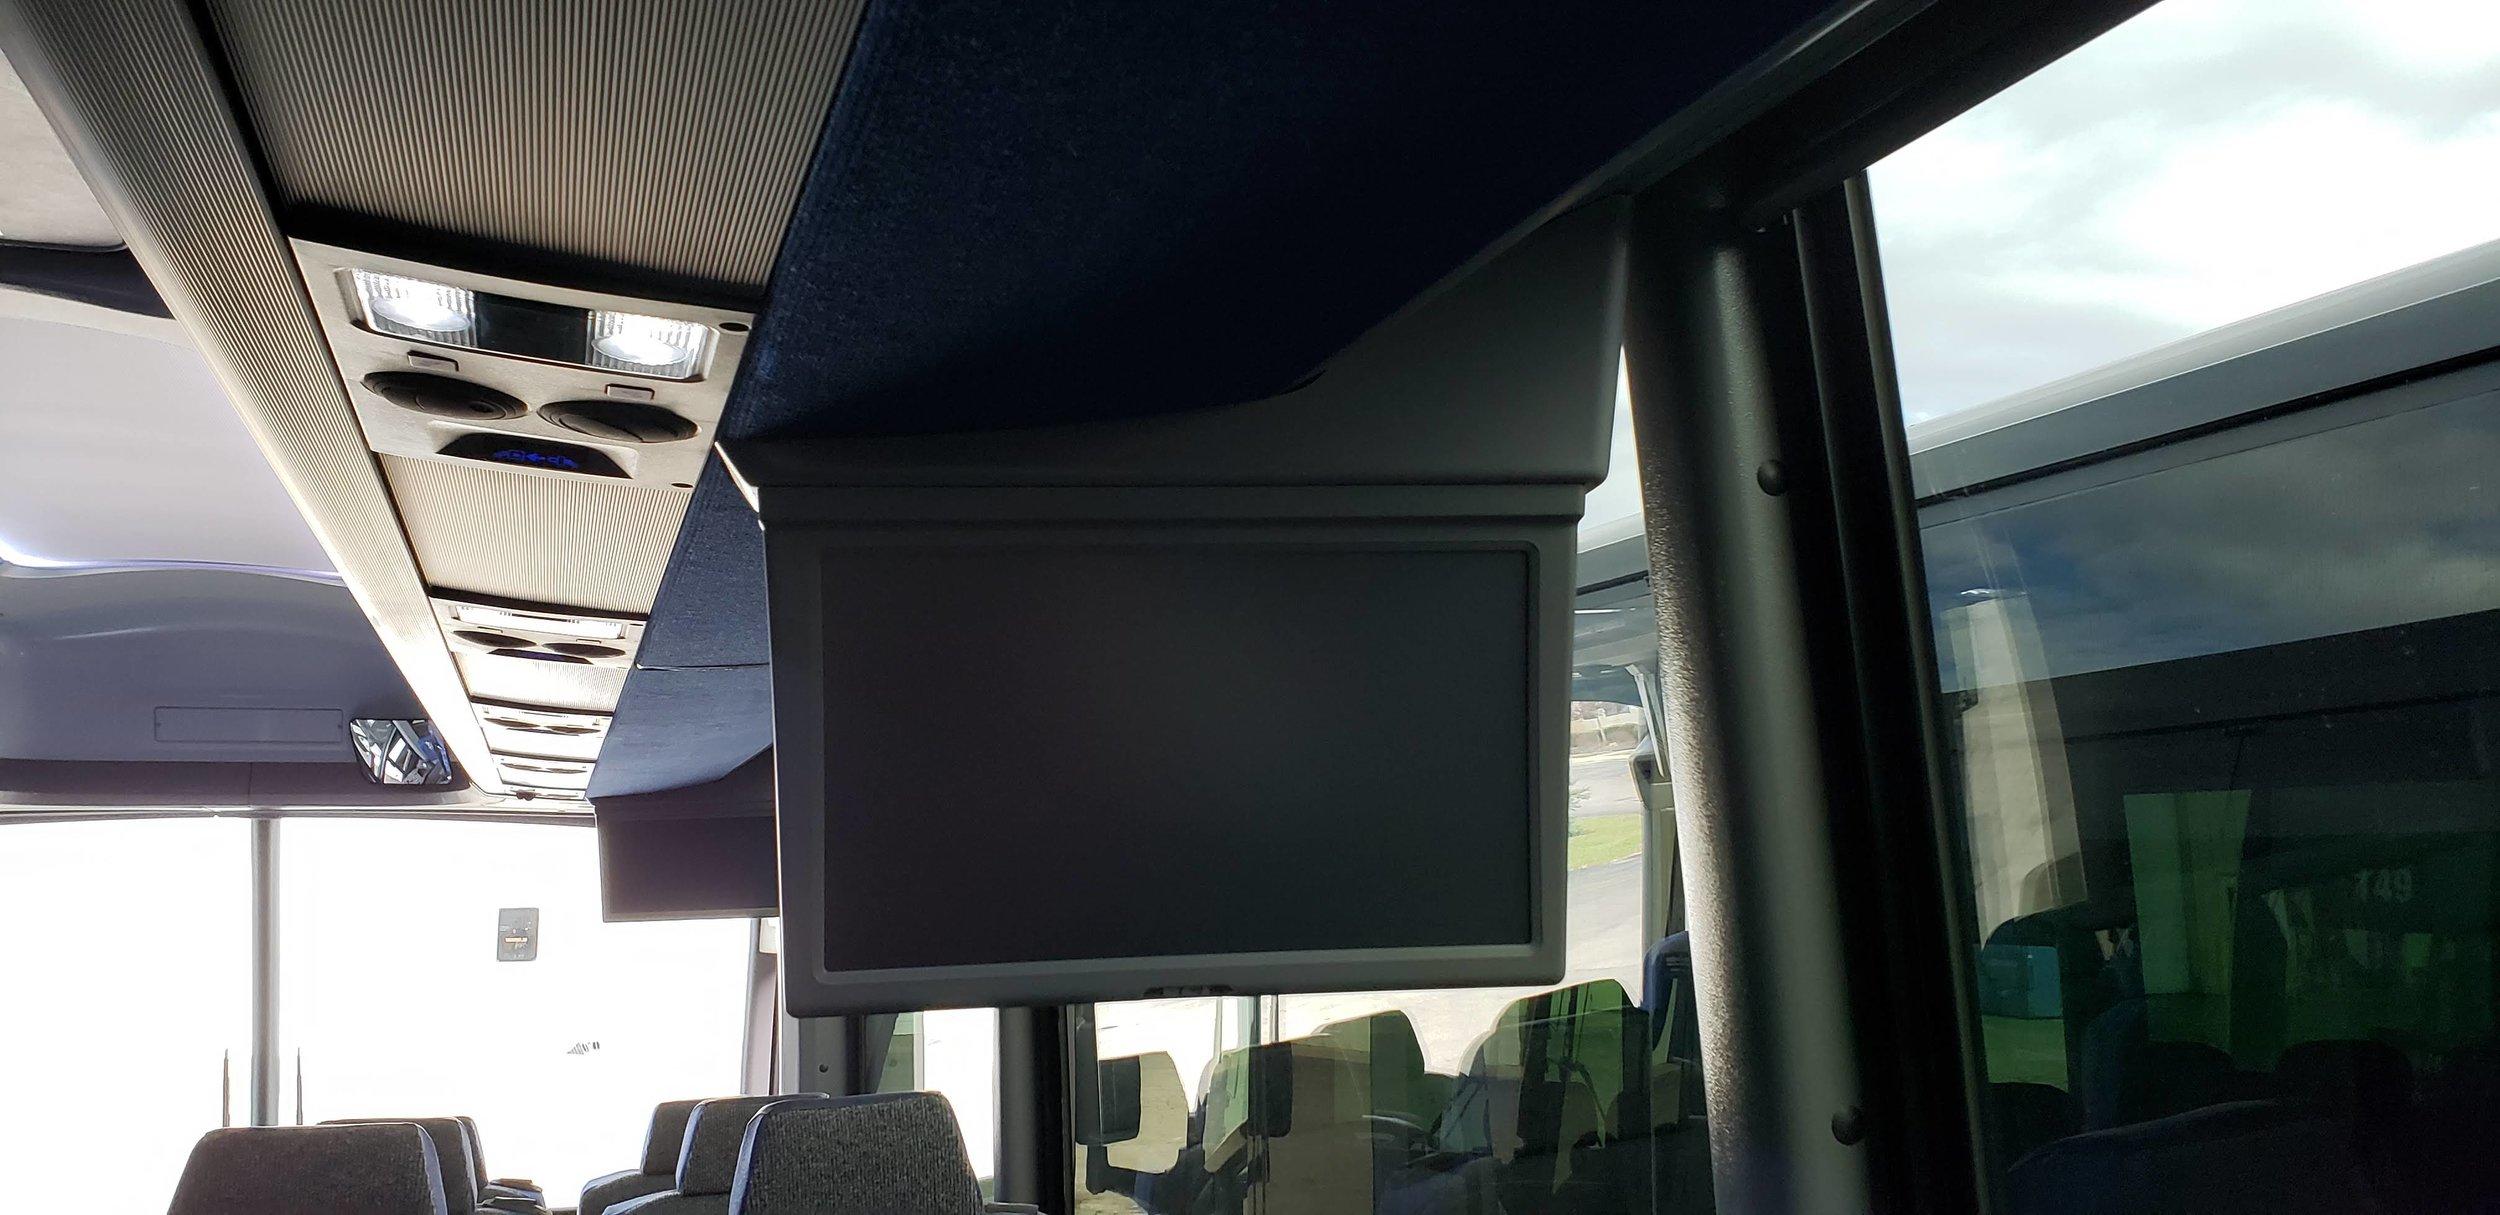 Motorcoach Passenger Flat Screens Reading Lights and Air Vents.jpg